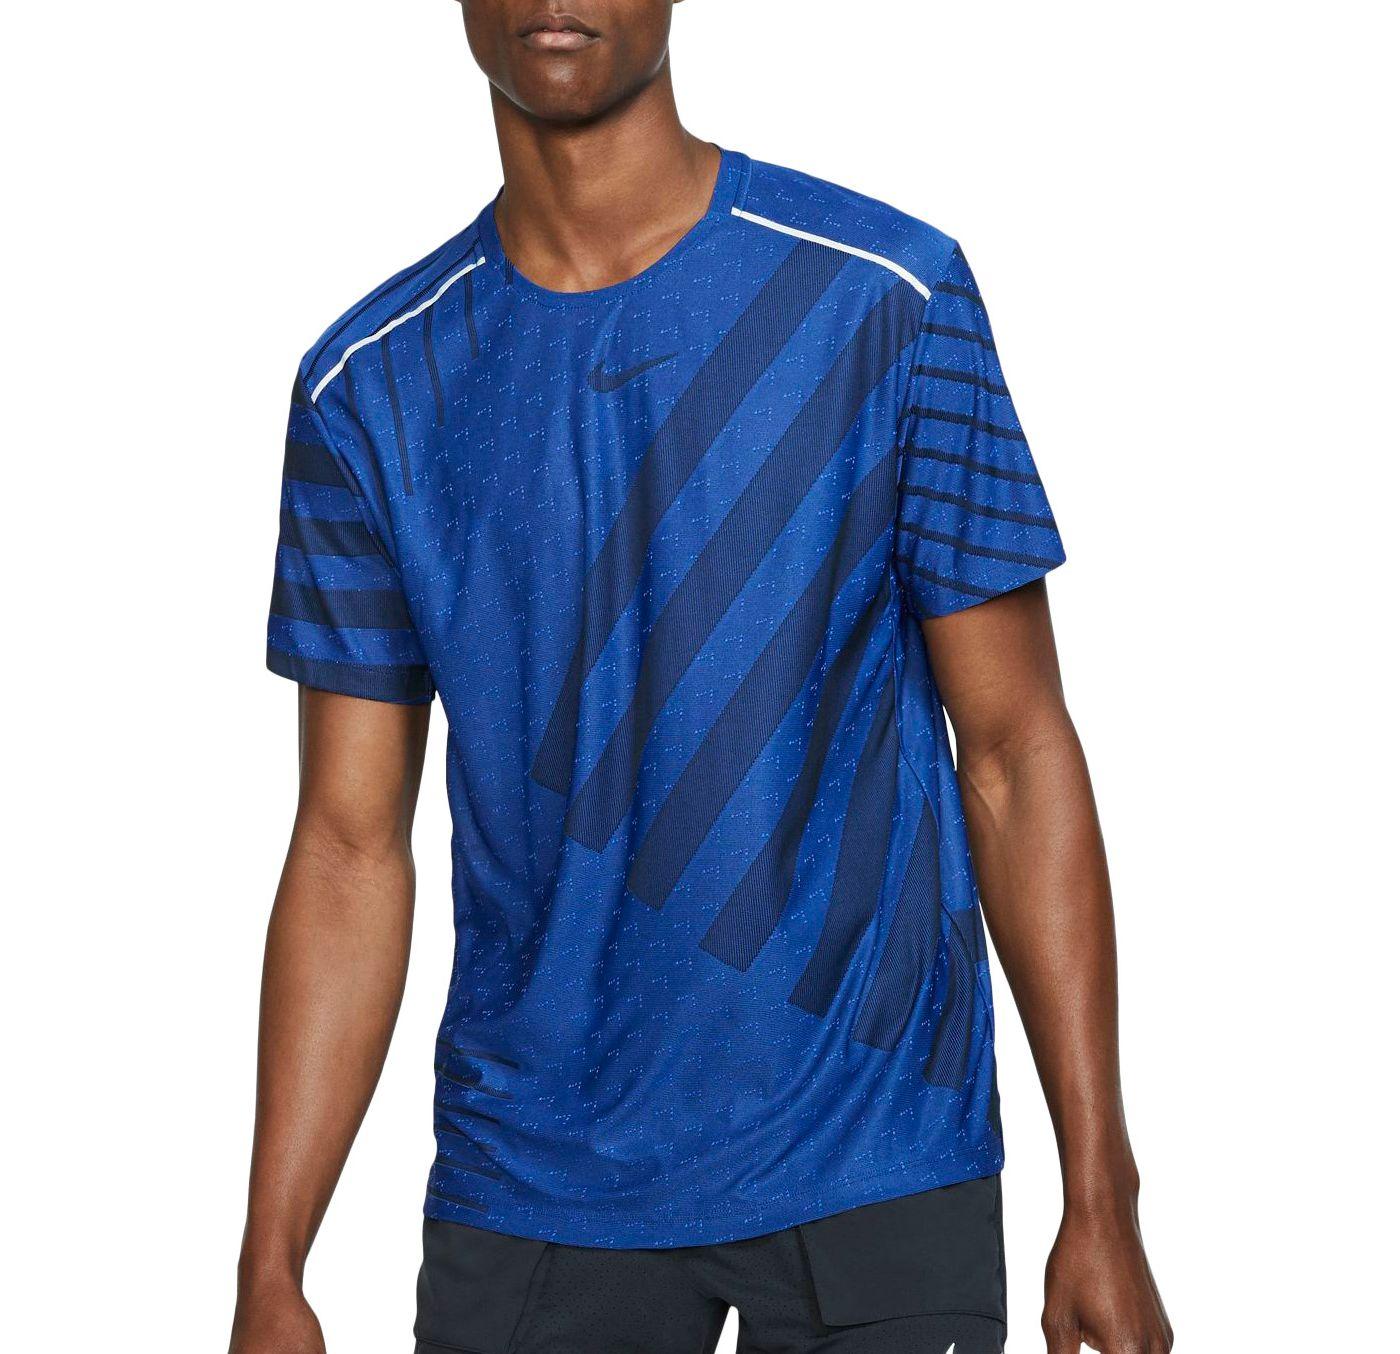 Nike Men's TechKnit Ultra Short Sleeve Running Top